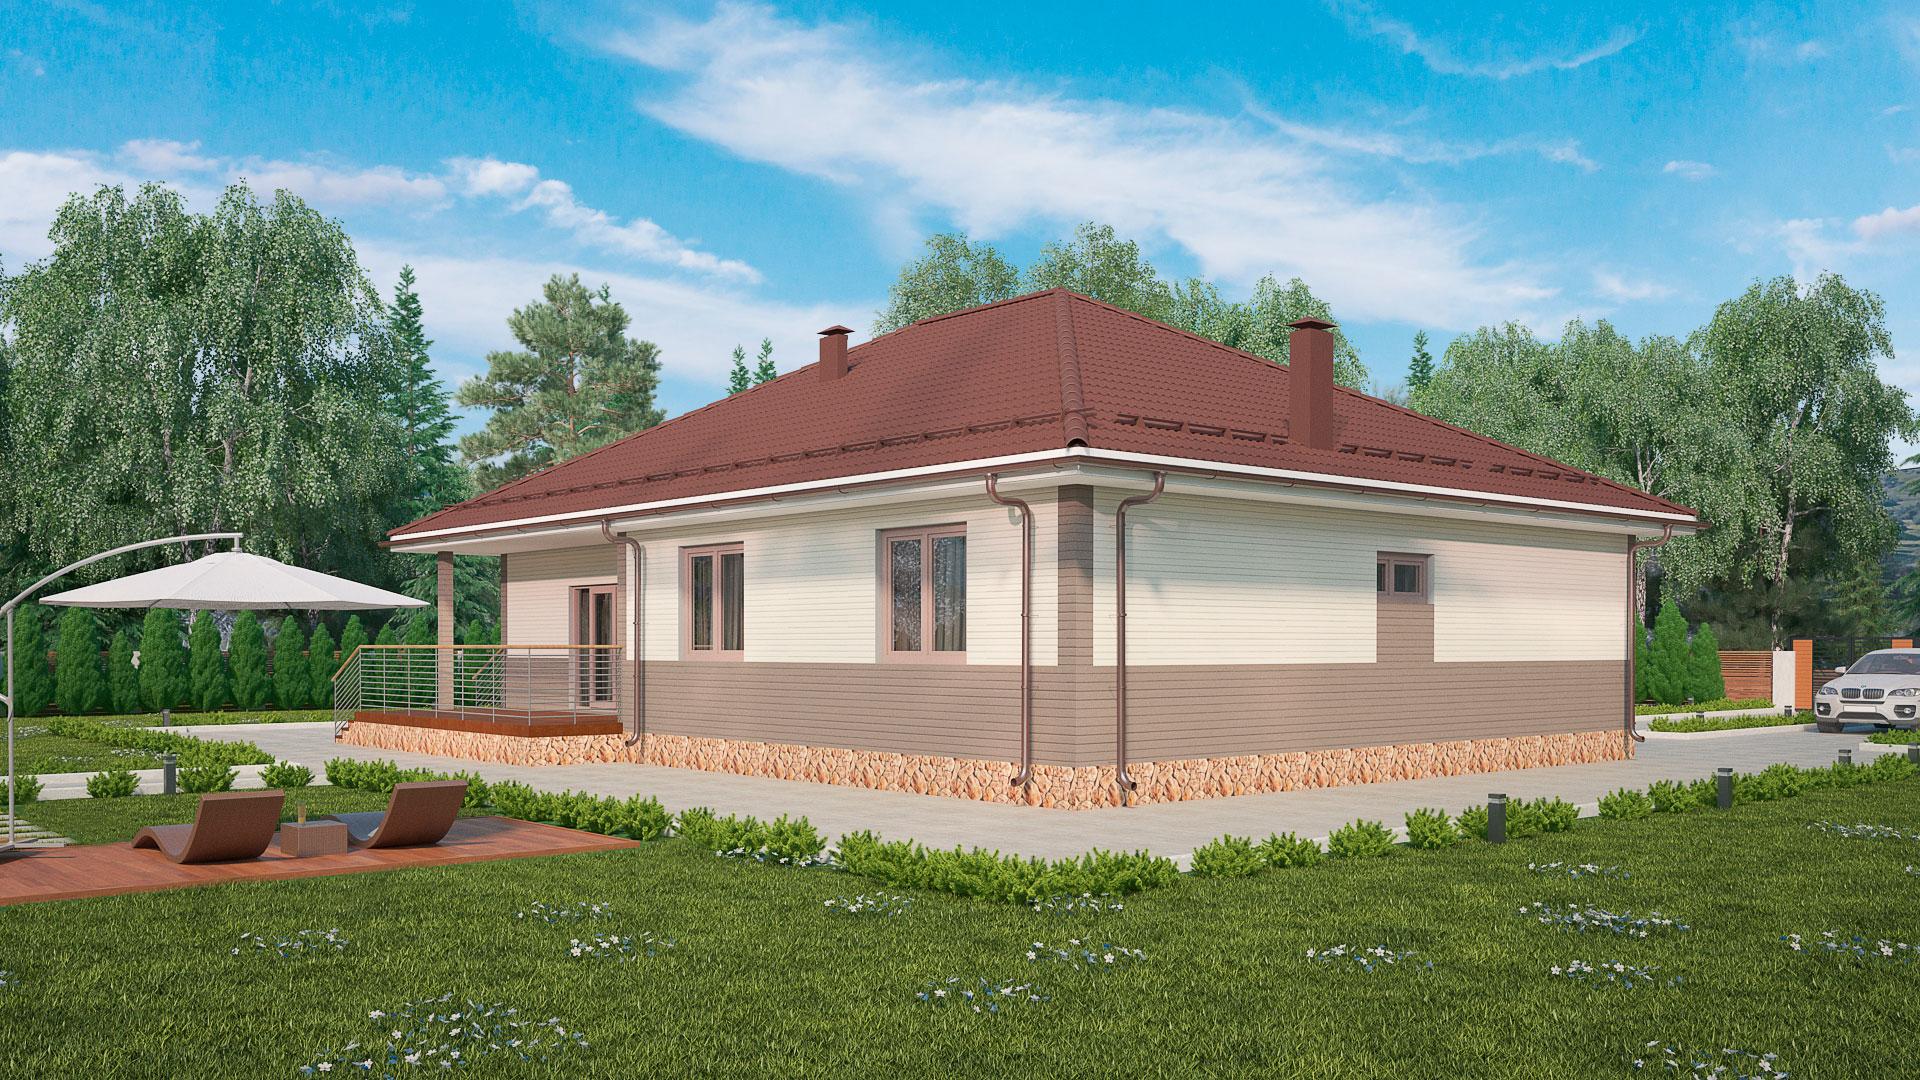 Боковой фасад одноэтажного дома с верандой, проект БЭНПАН МС-178.